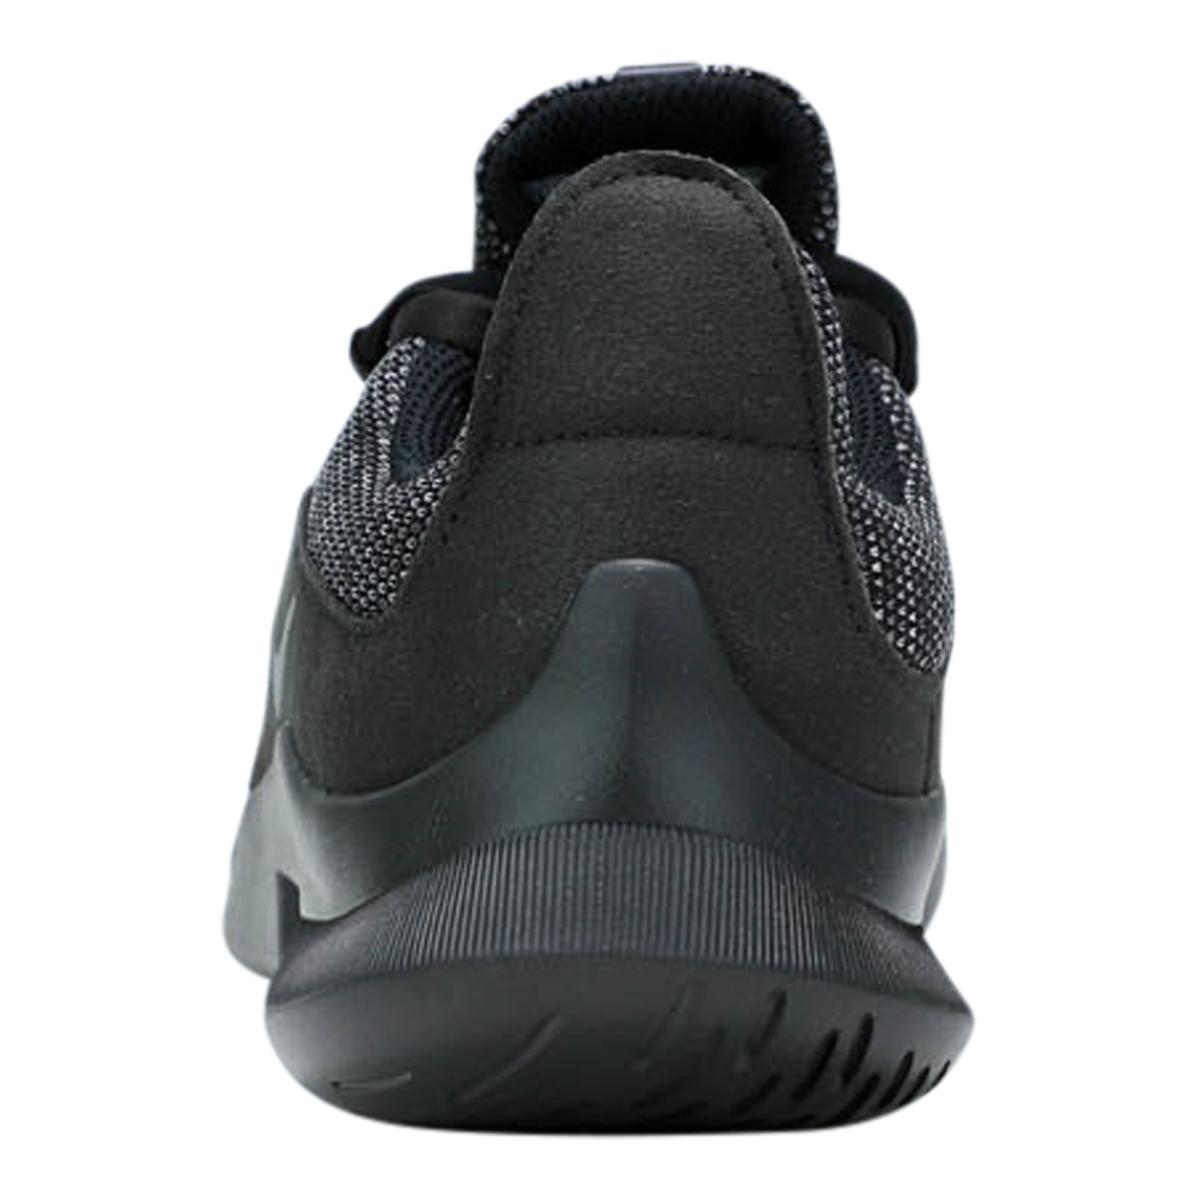 Nike-Men-039-s-Viale-Premium-Running-Shoes thumbnail 5